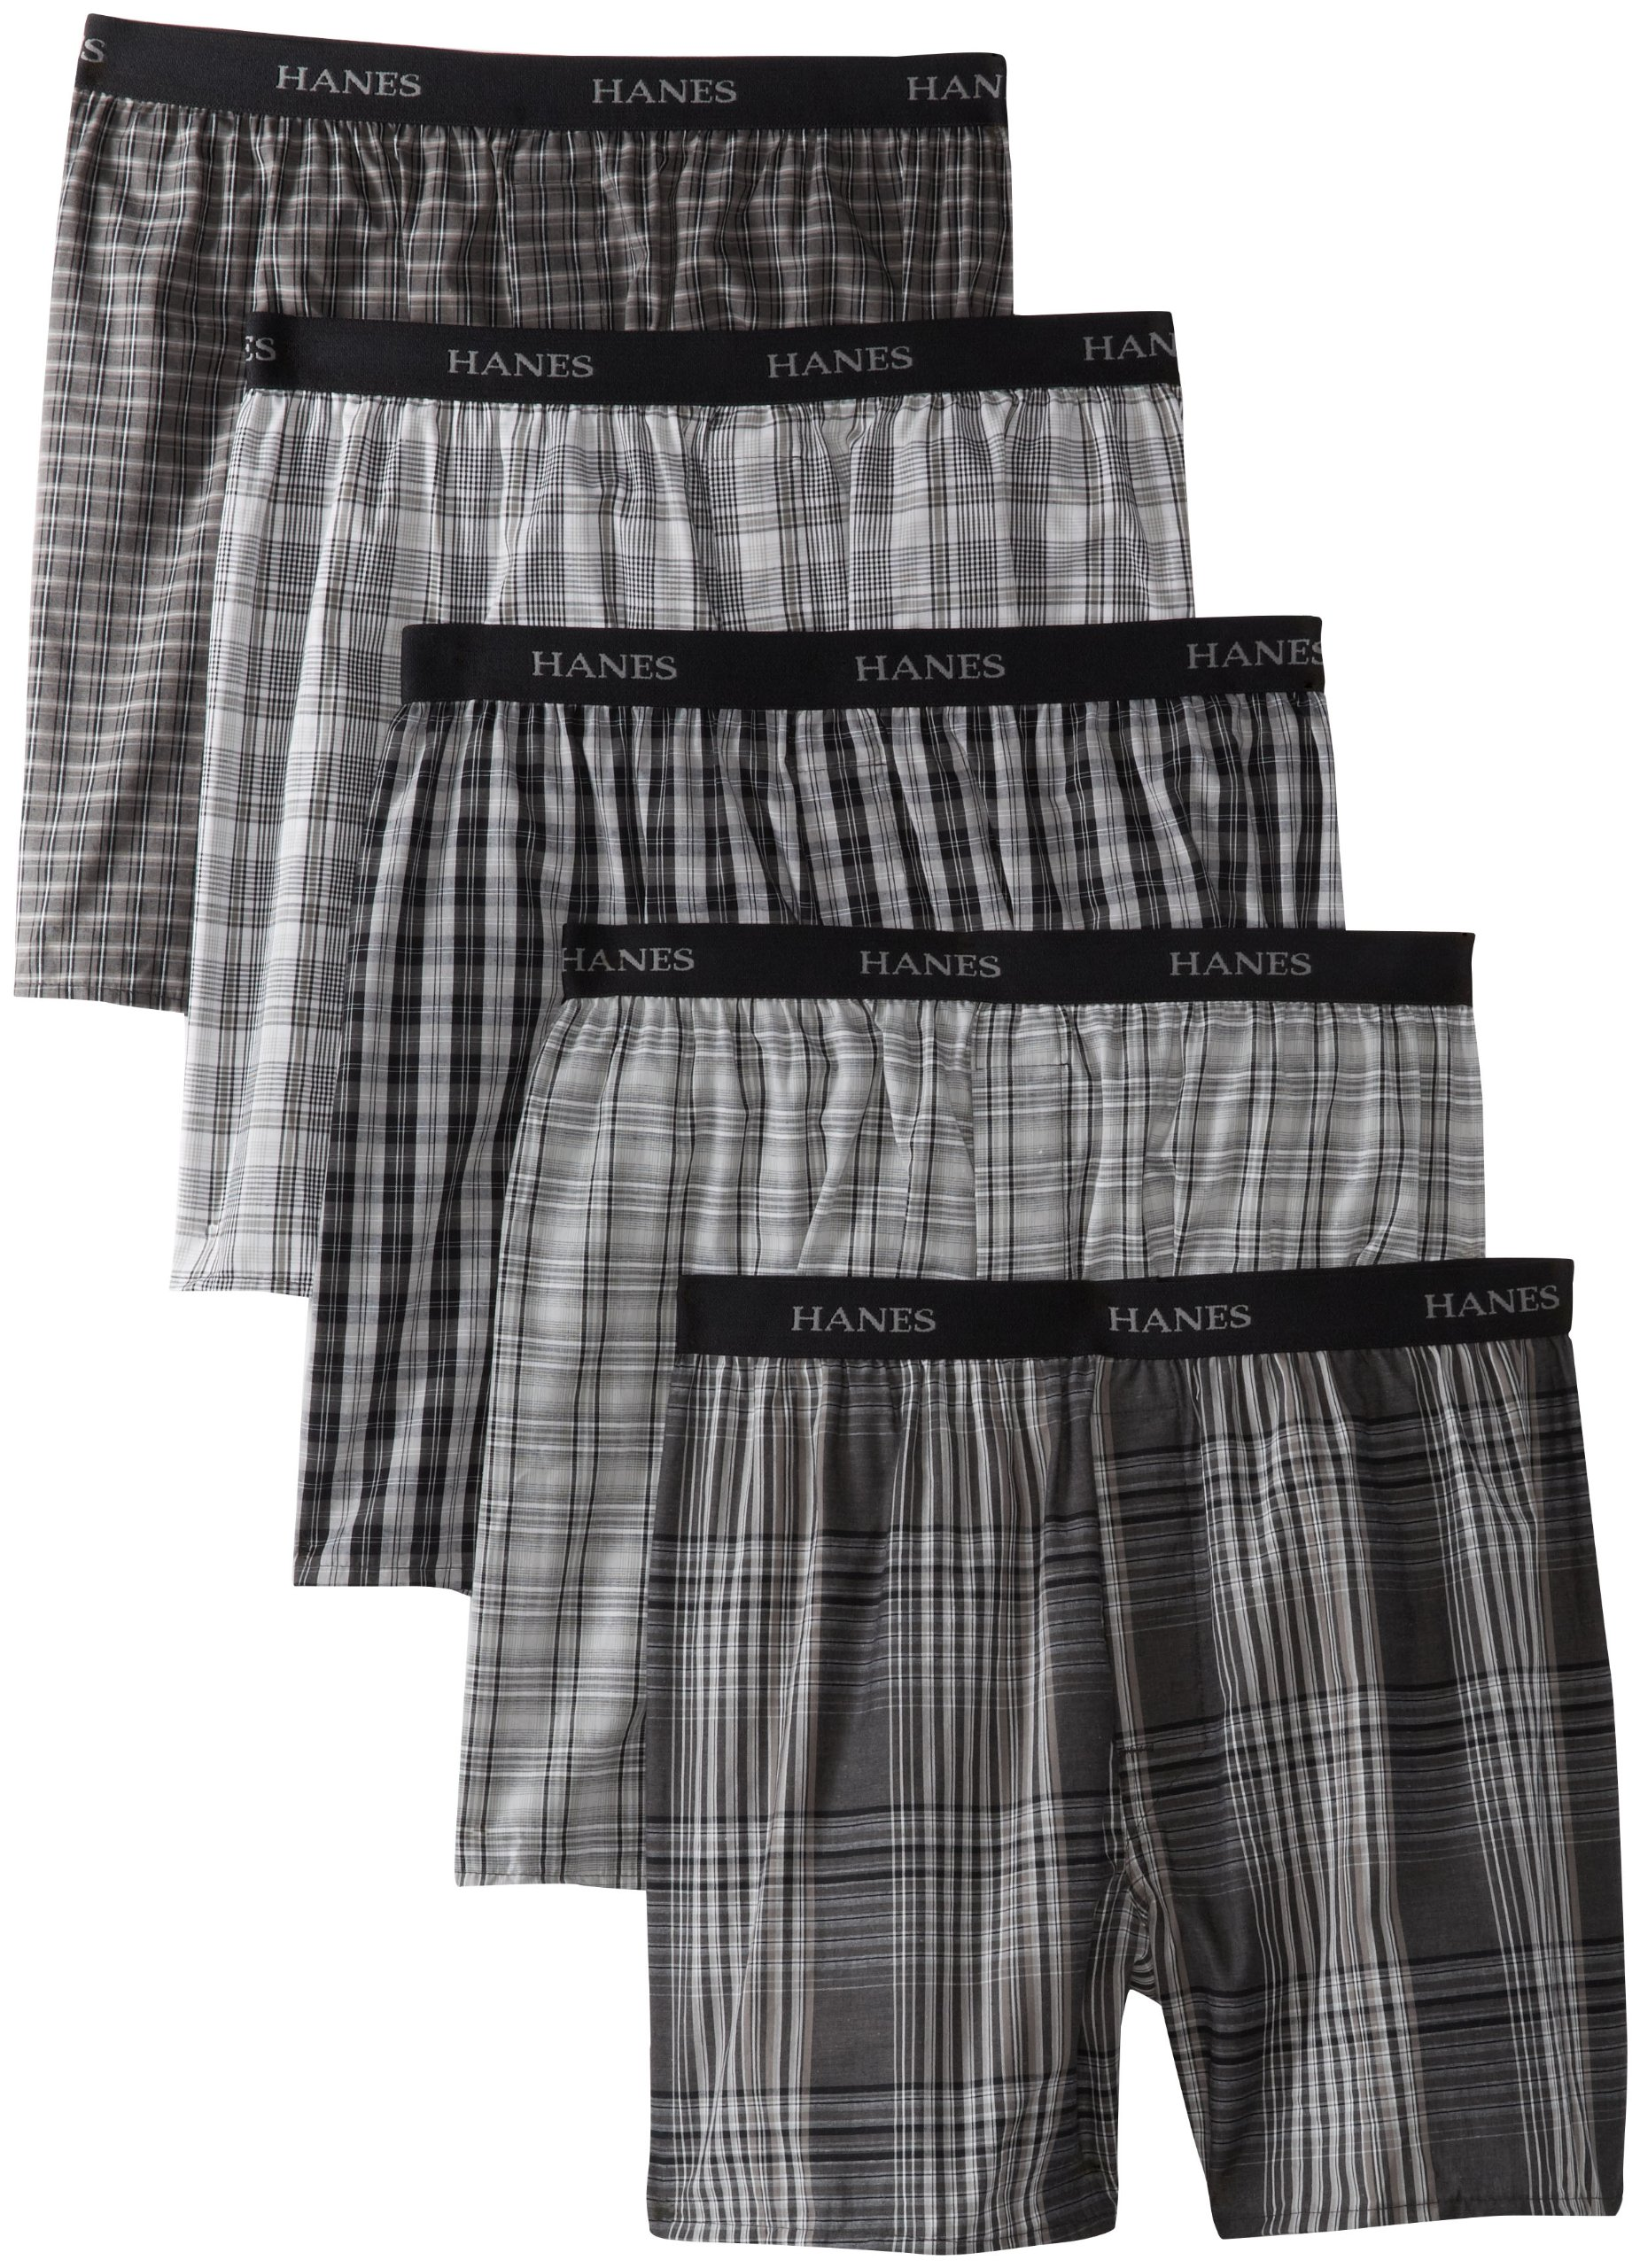 Hanes Ultimate Men's 5-Pack Yarn Dye Exposed Waistband Boxer - Colors May Vary, Black/Blue, Medium